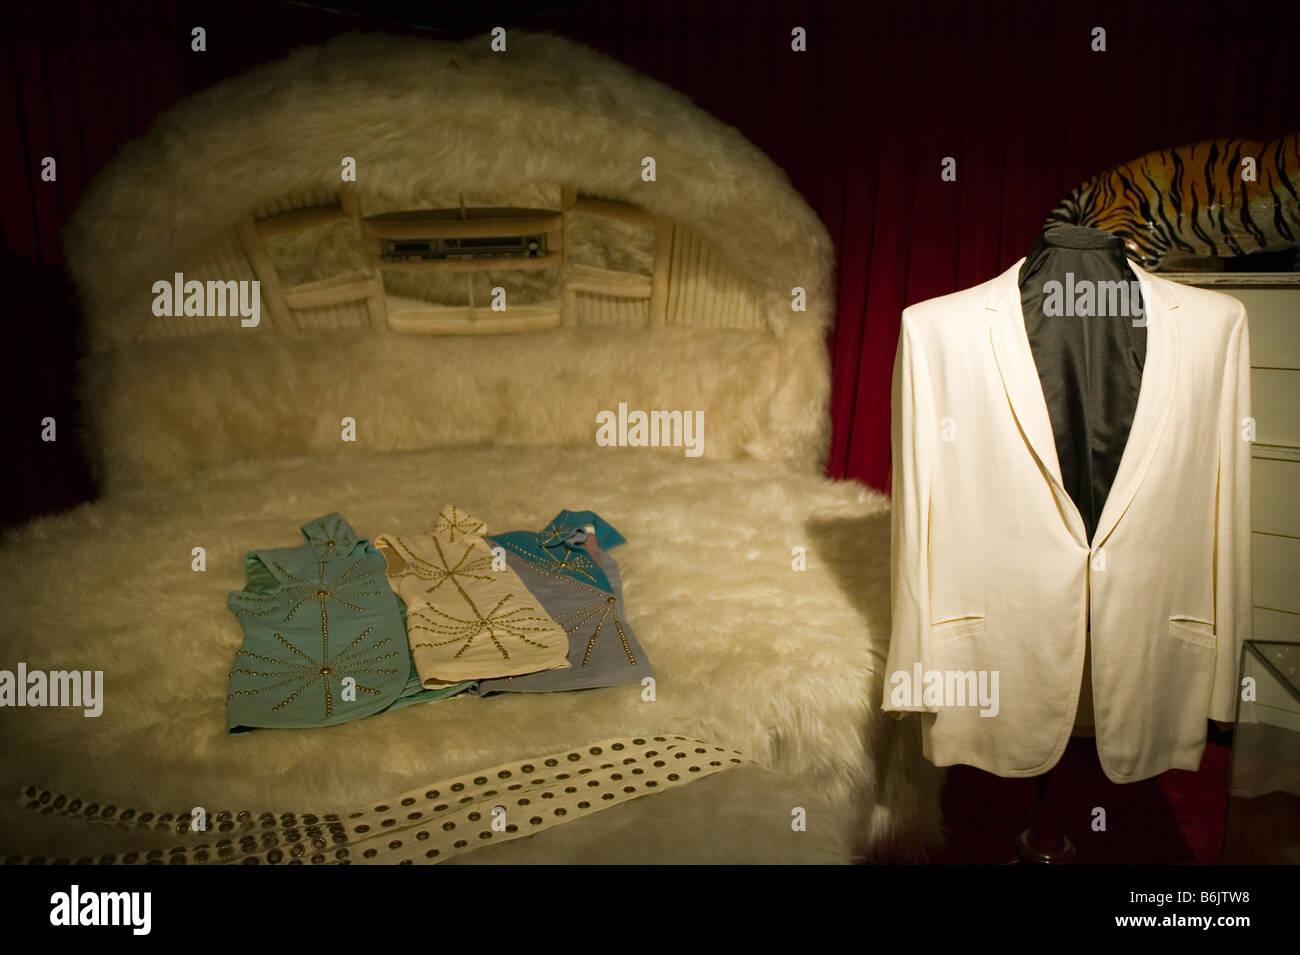 Usa Tennessee Memphis Graceland Elvis Bedroom White Suit Jacket Stock Photo Alamy